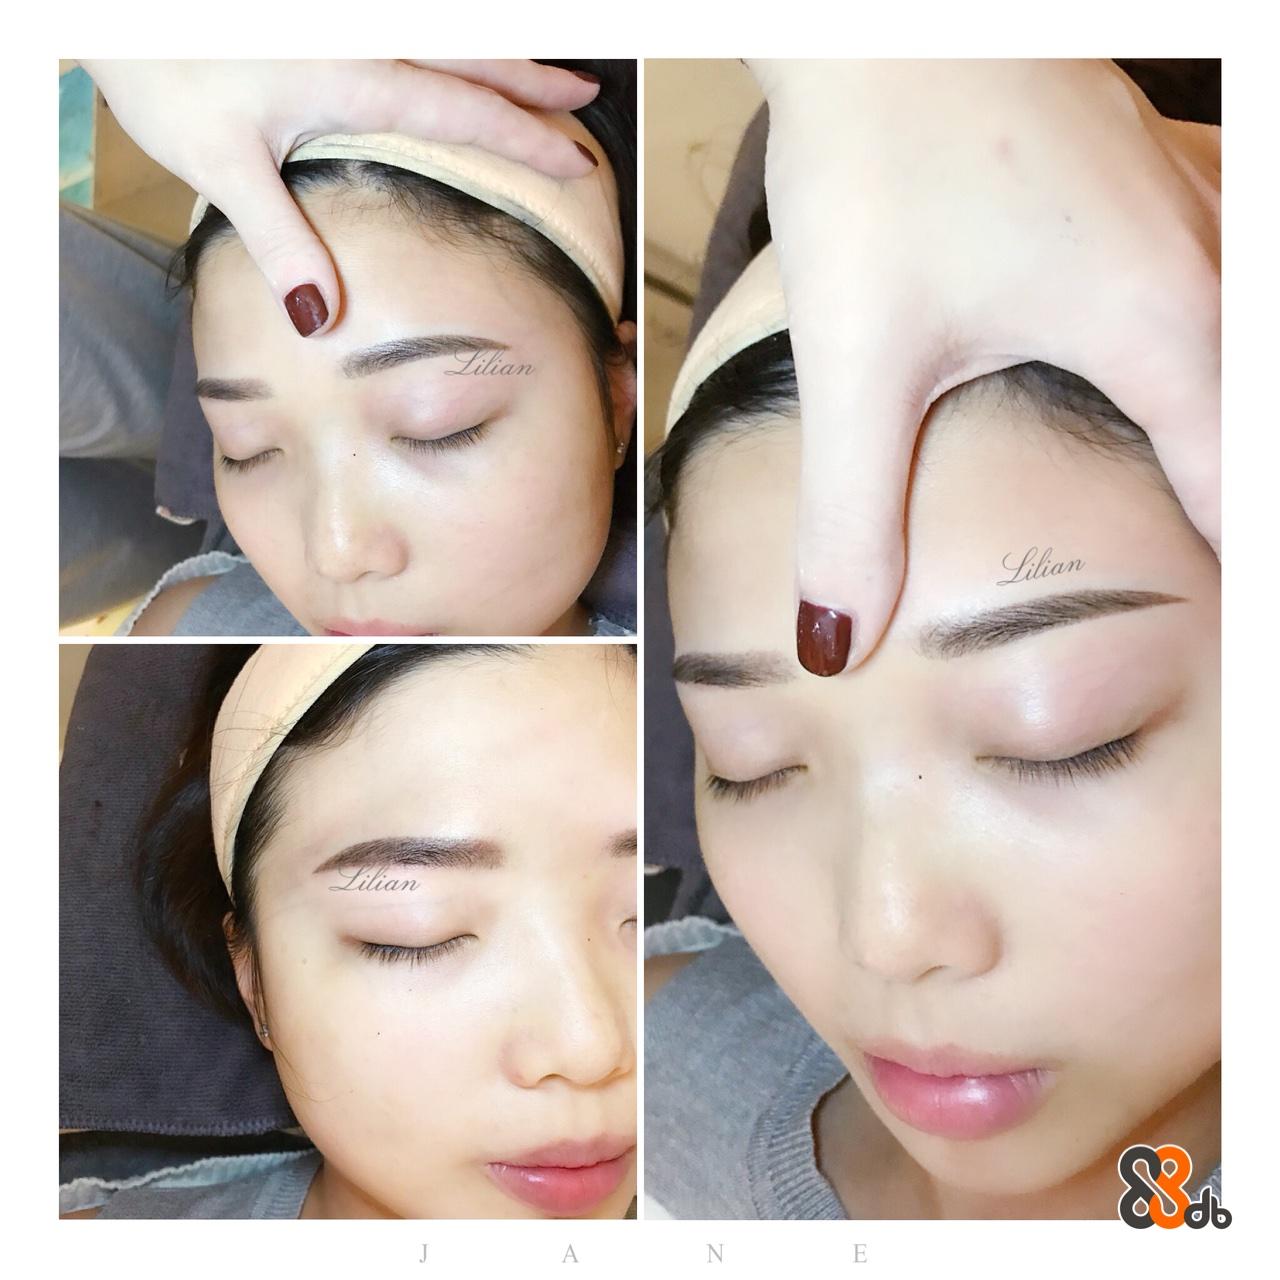 warn an an  eyebrow,face,skin,cheek,nose